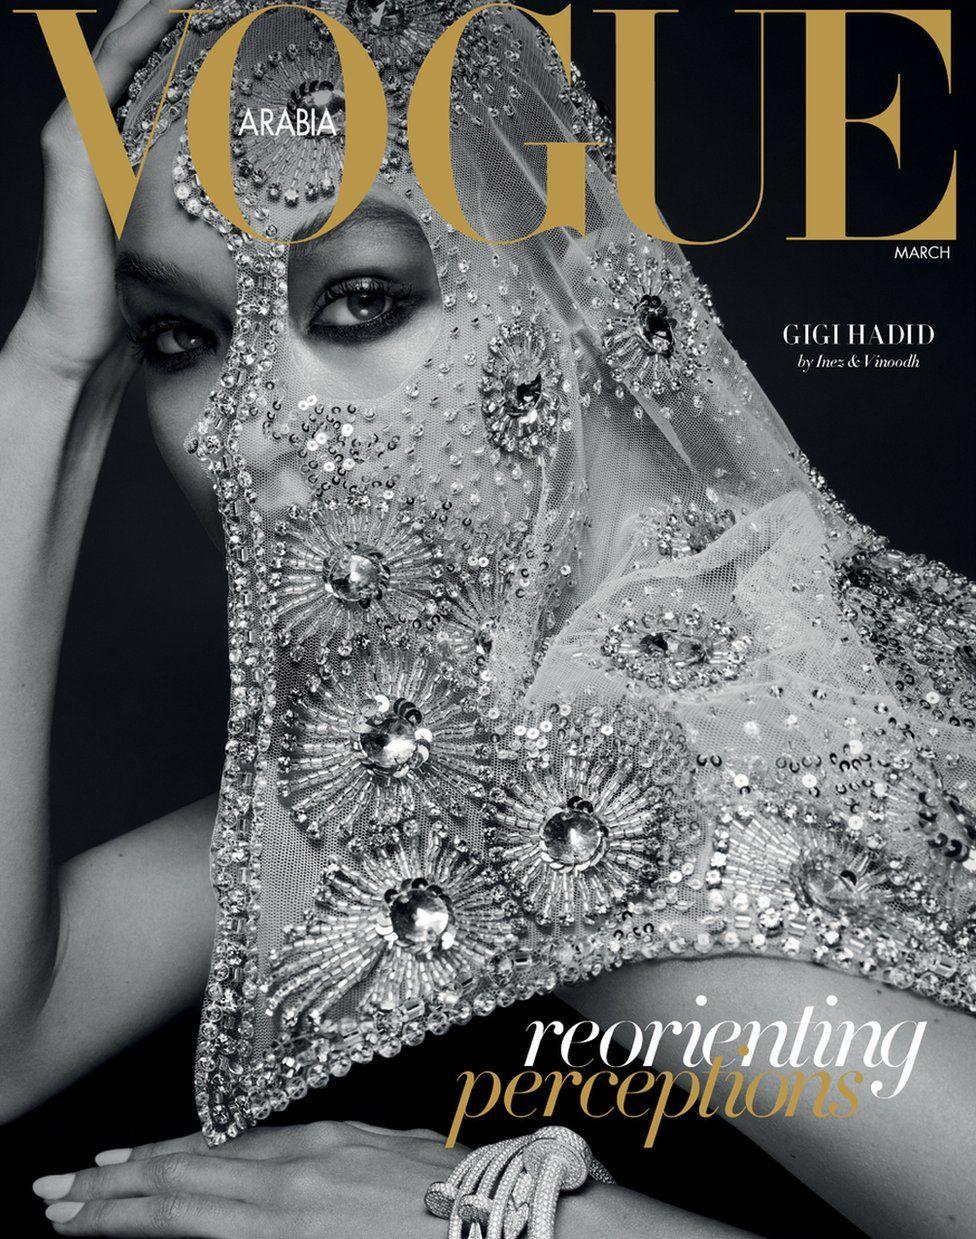 GiGi Hadid on the cover of Vogue Arabia